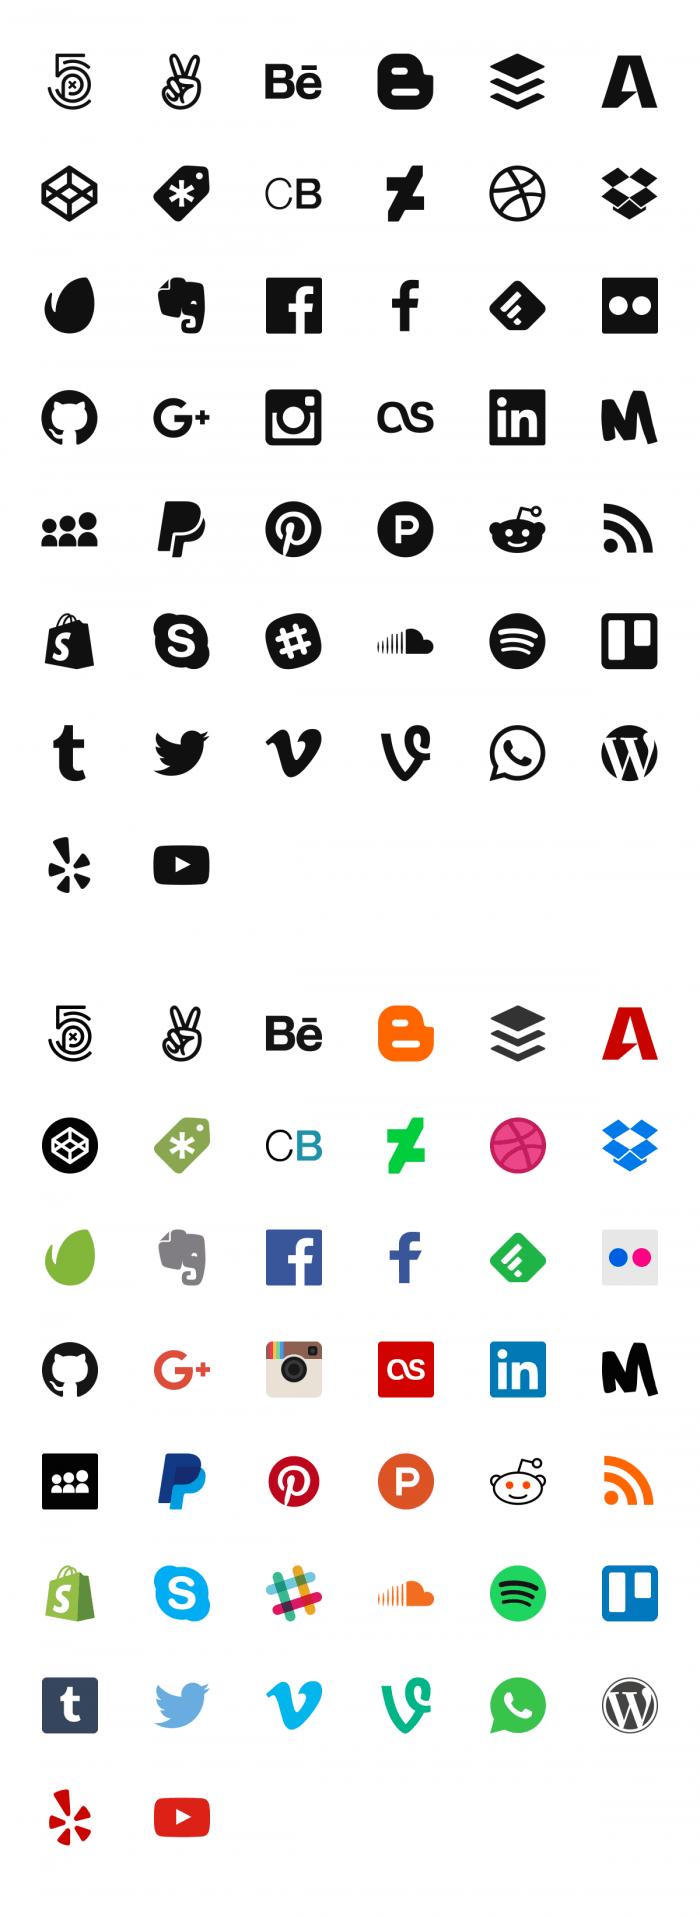 Free Social Media Icons | IconStore